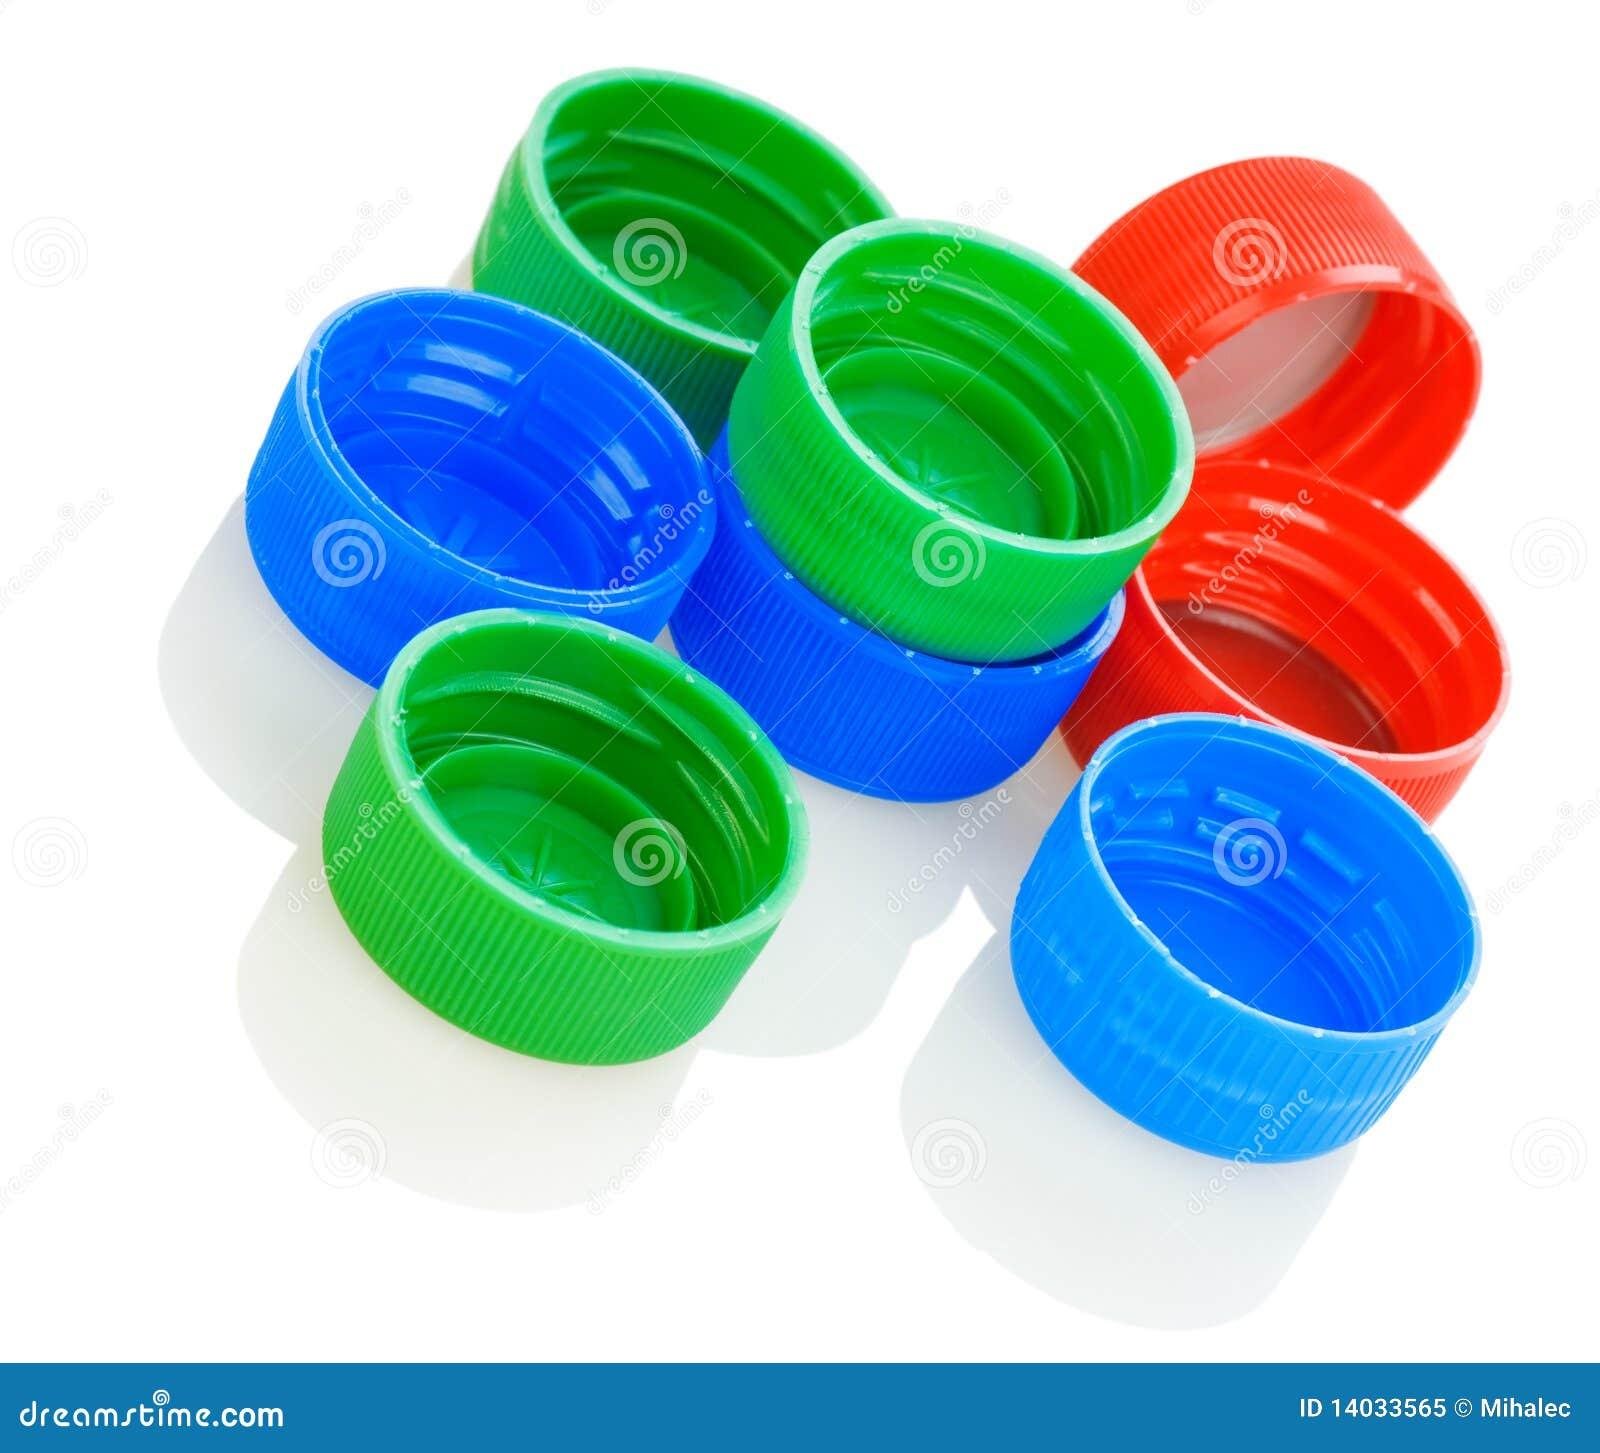 Tapas pl sticas coloridas foto de archivo libre de for Tapas de plastico